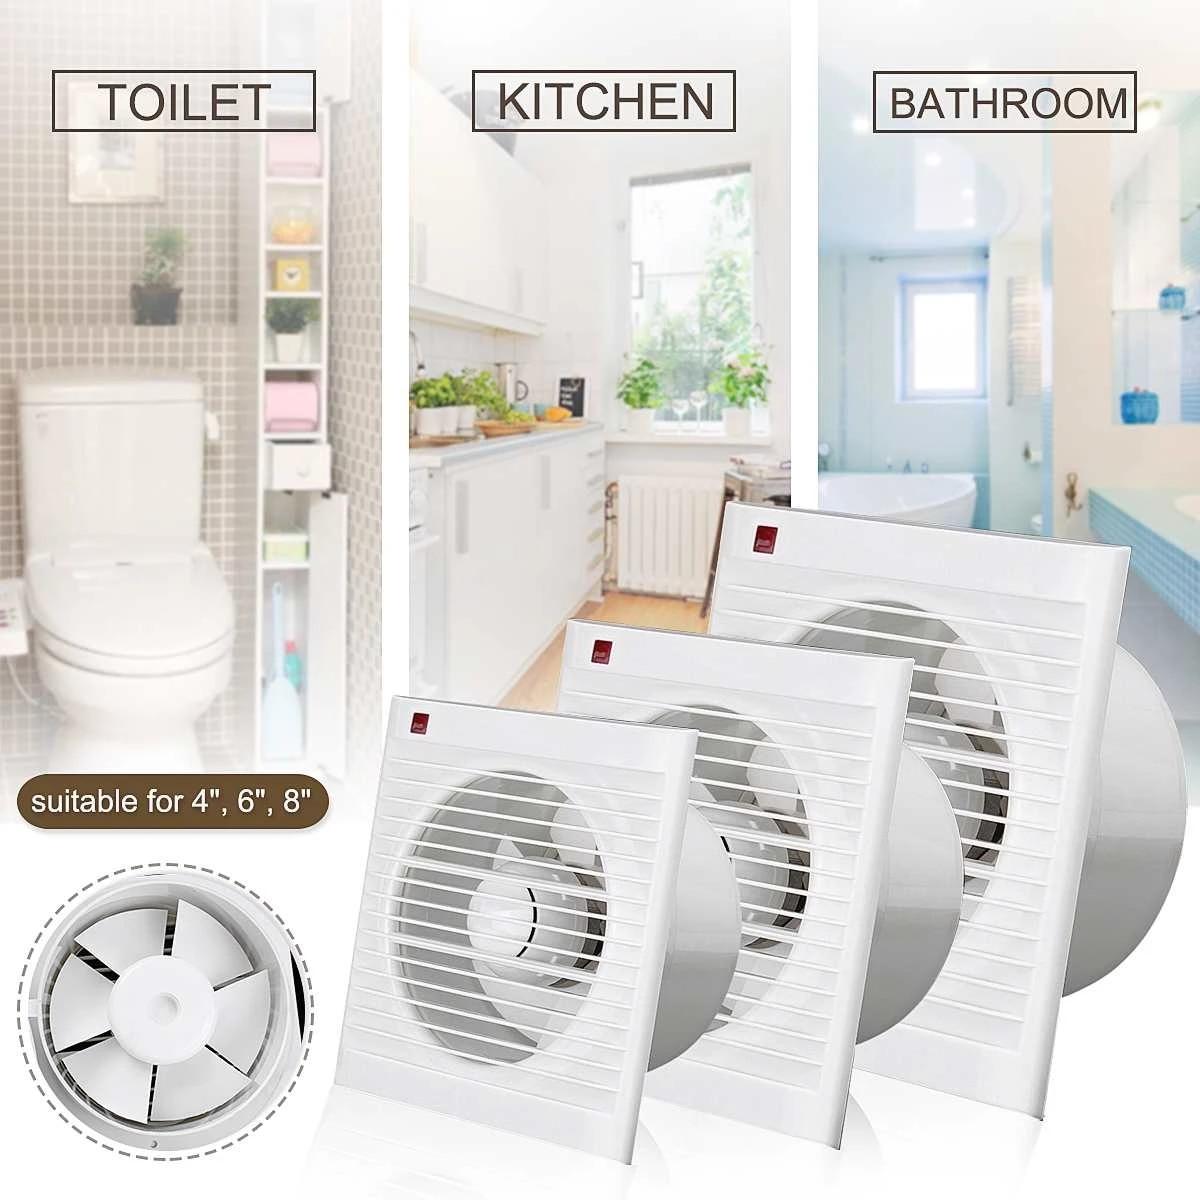 4inch 6 inch 8 inch waterproof mute bathroom extractor exhaust fan window for kitchen toilet ventilation fans